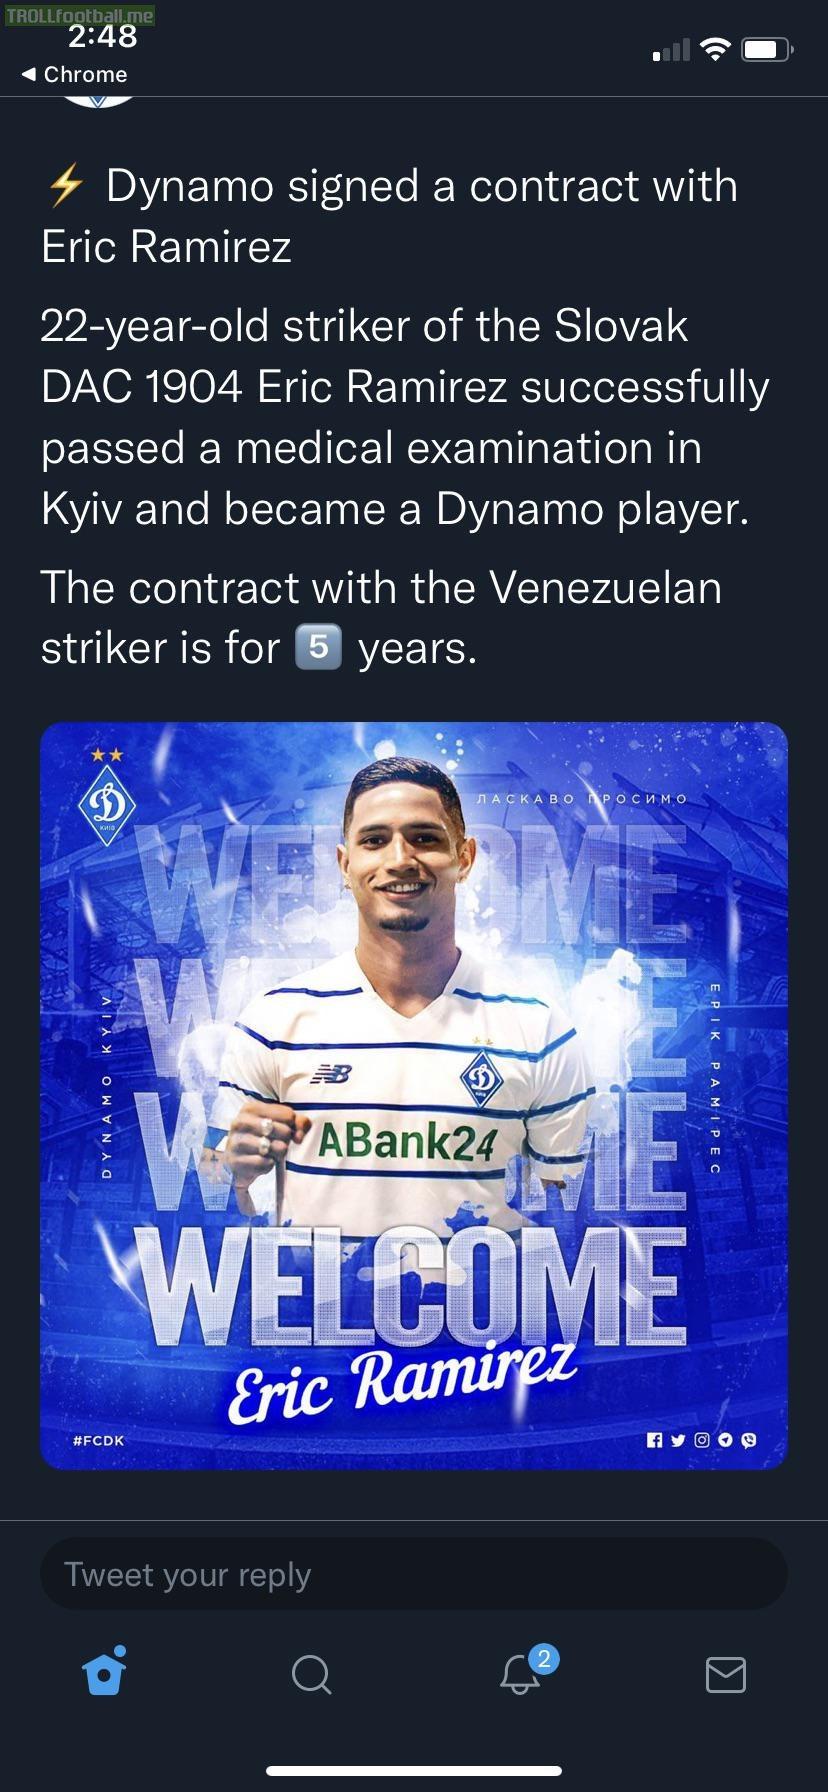 [dynamokyiven] Eric Ramirez 🇻🇪 signs 5 year deal with Dynamo Kyiv